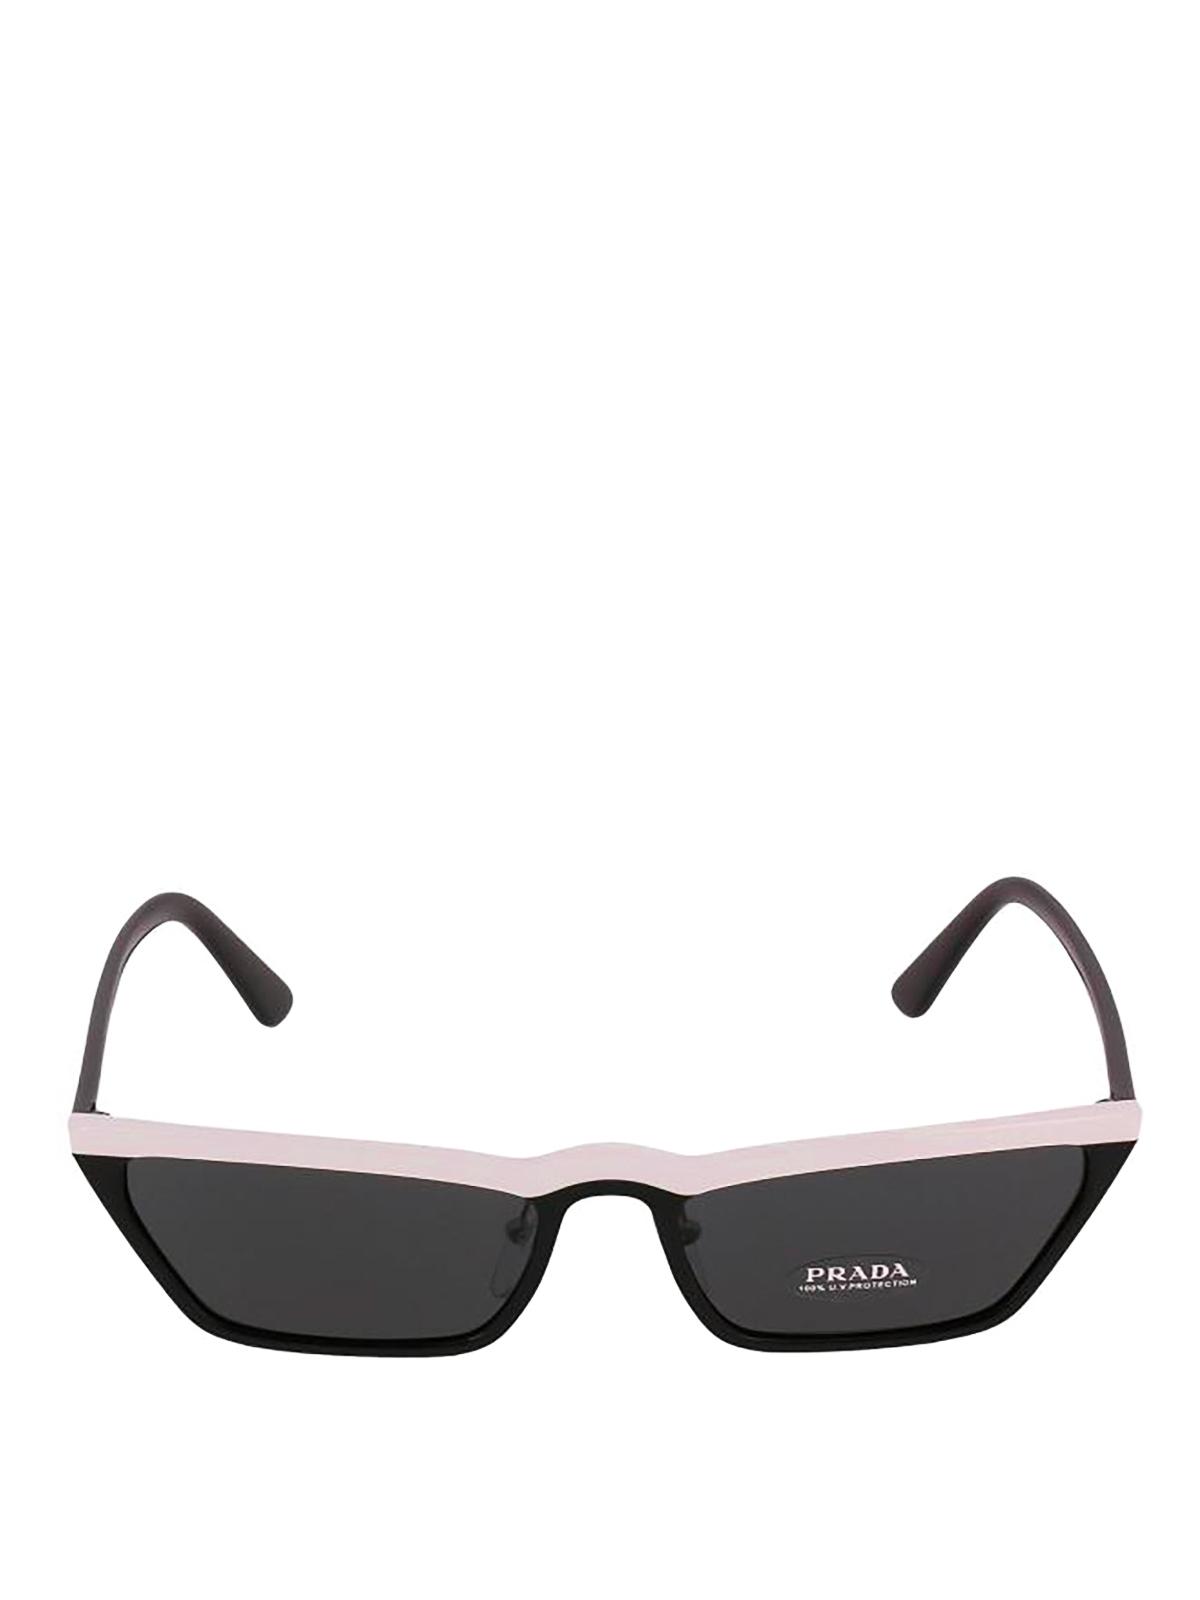 fb43ac45fd9a Prada - Ultravox black and pink sunglasses - sunglasses - SPR19U YC45S0